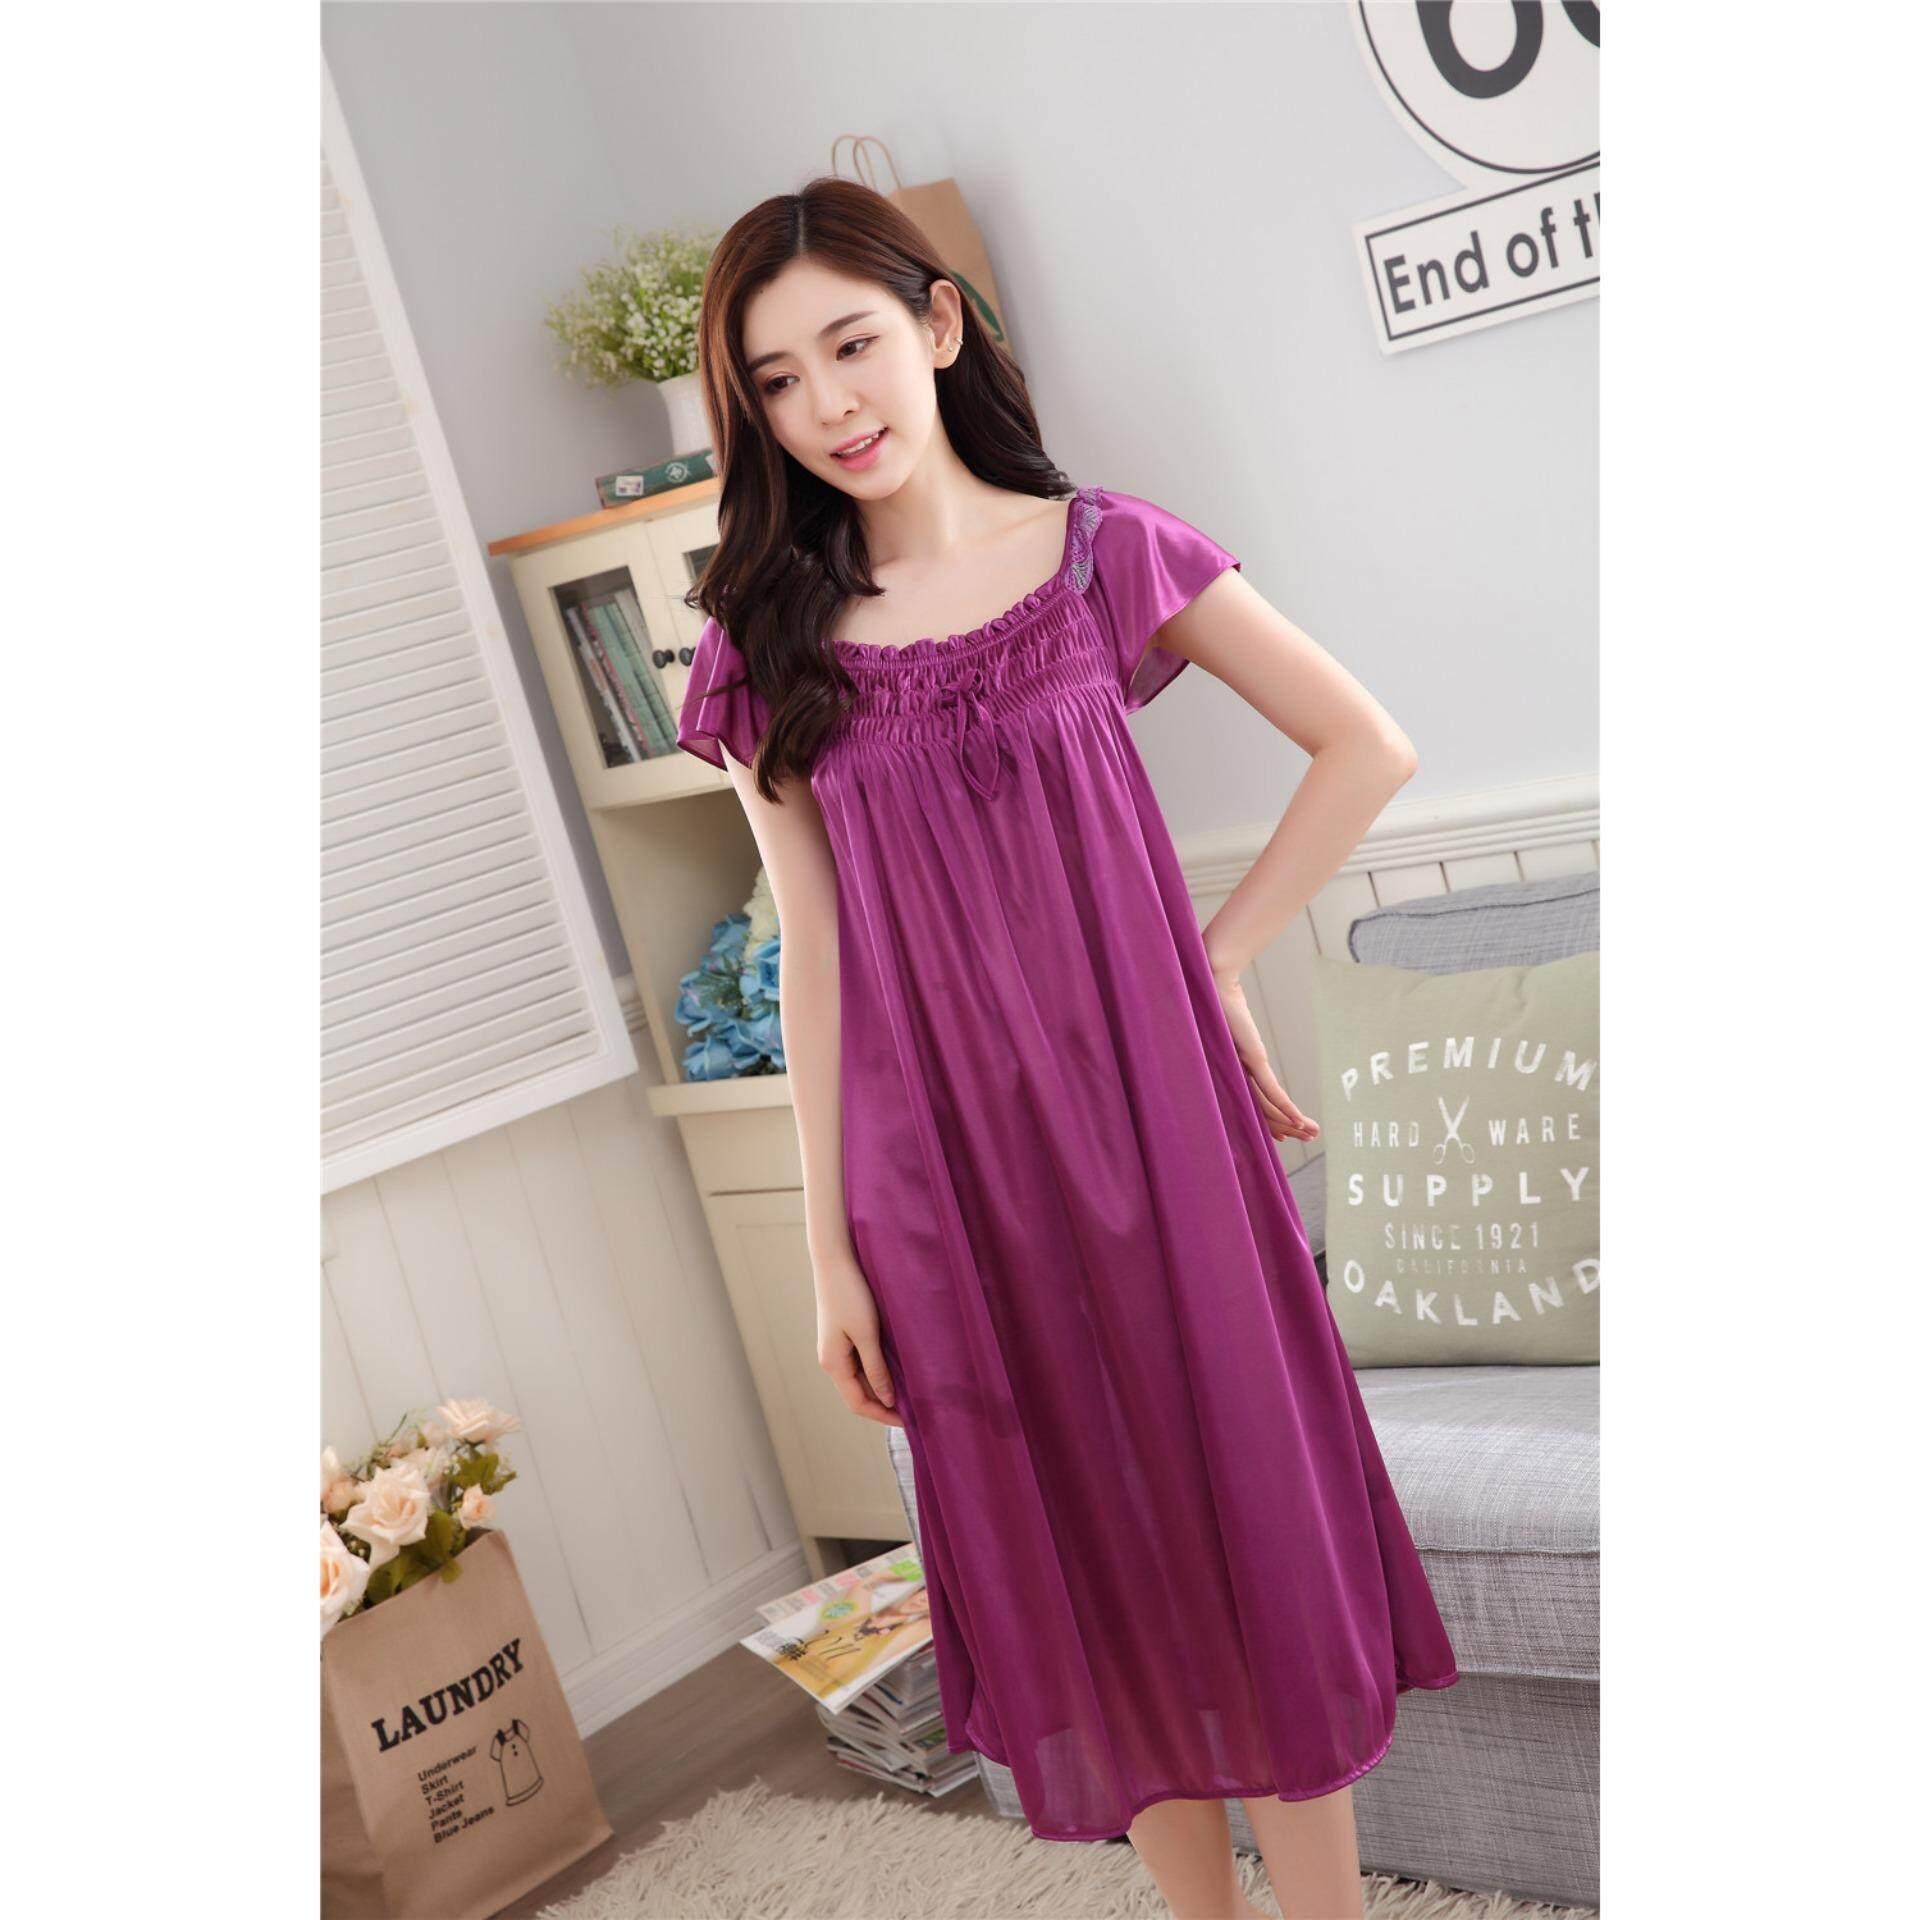 Bolster Store Ladies Women Sexy Lingerie Sleepwear Pajamas Pyjamas Long Dress Silk Sleeve Comfortable Wear (Dark Purple)